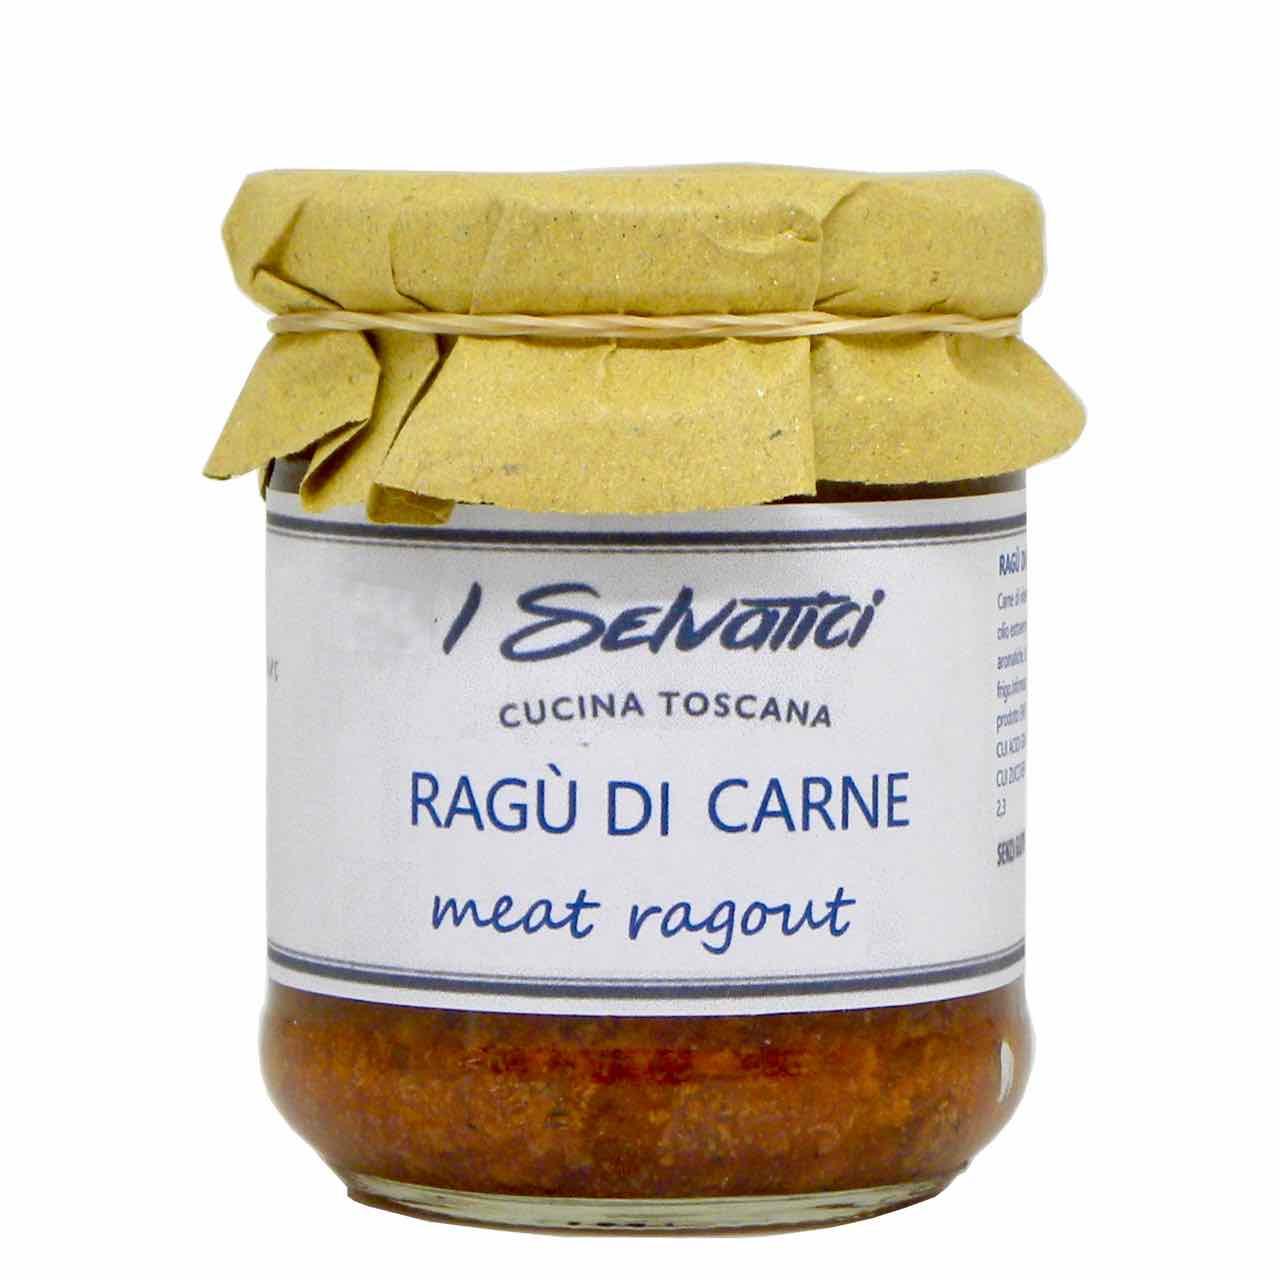 meat ragu – best Italian food – Gustorotondo online food shop – authentic Italian artisan food online